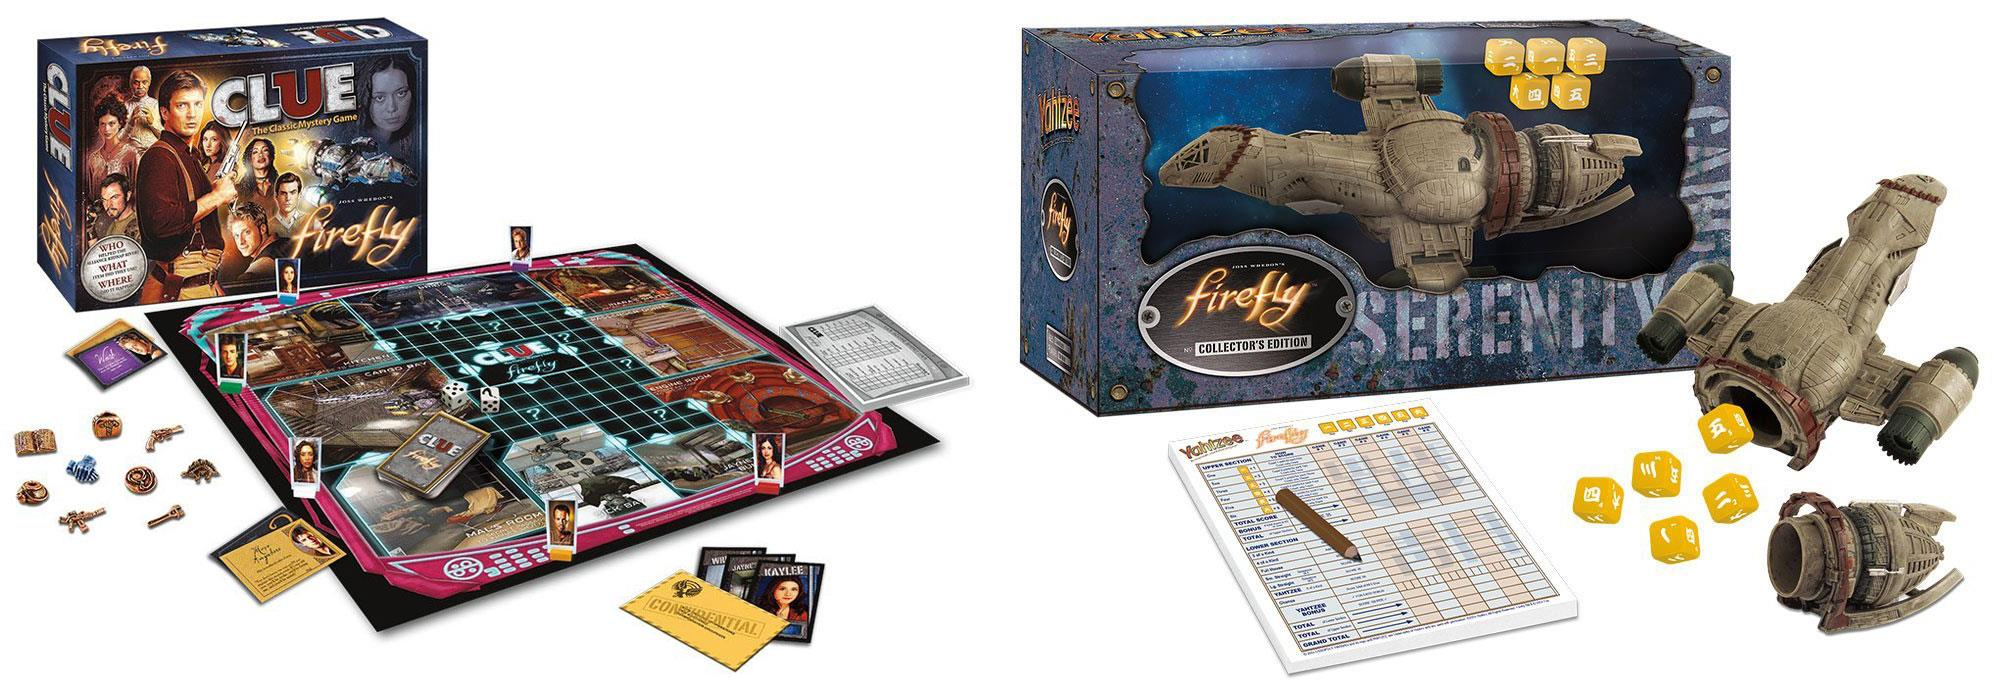 I giochi da tavolo di Firefly: cluedo e yahtzee